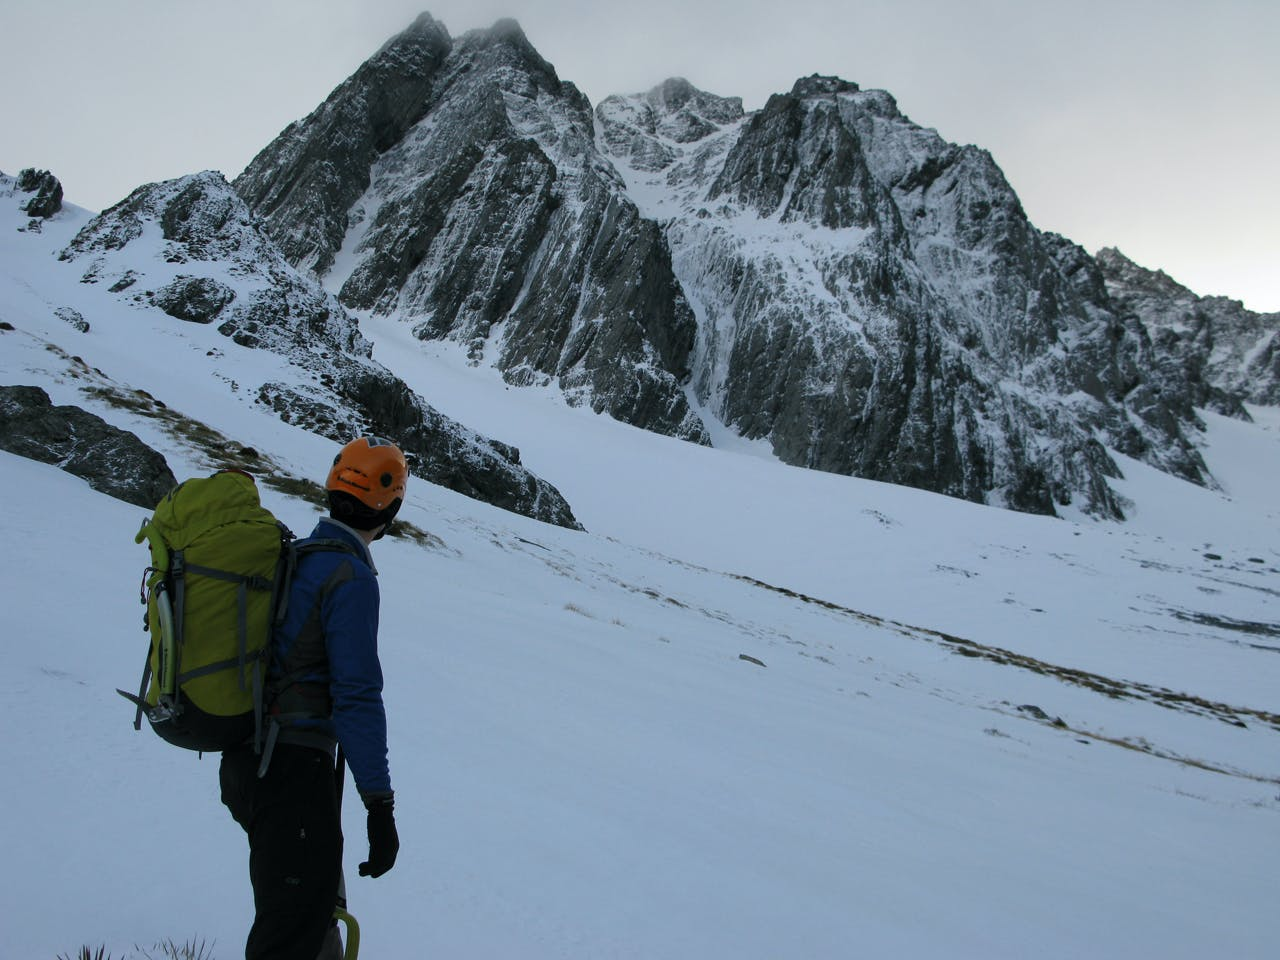 Dasler Pinnacles in winter. The North Ridge is tucked away on the left hand skyline. Photo: Paul Hersey